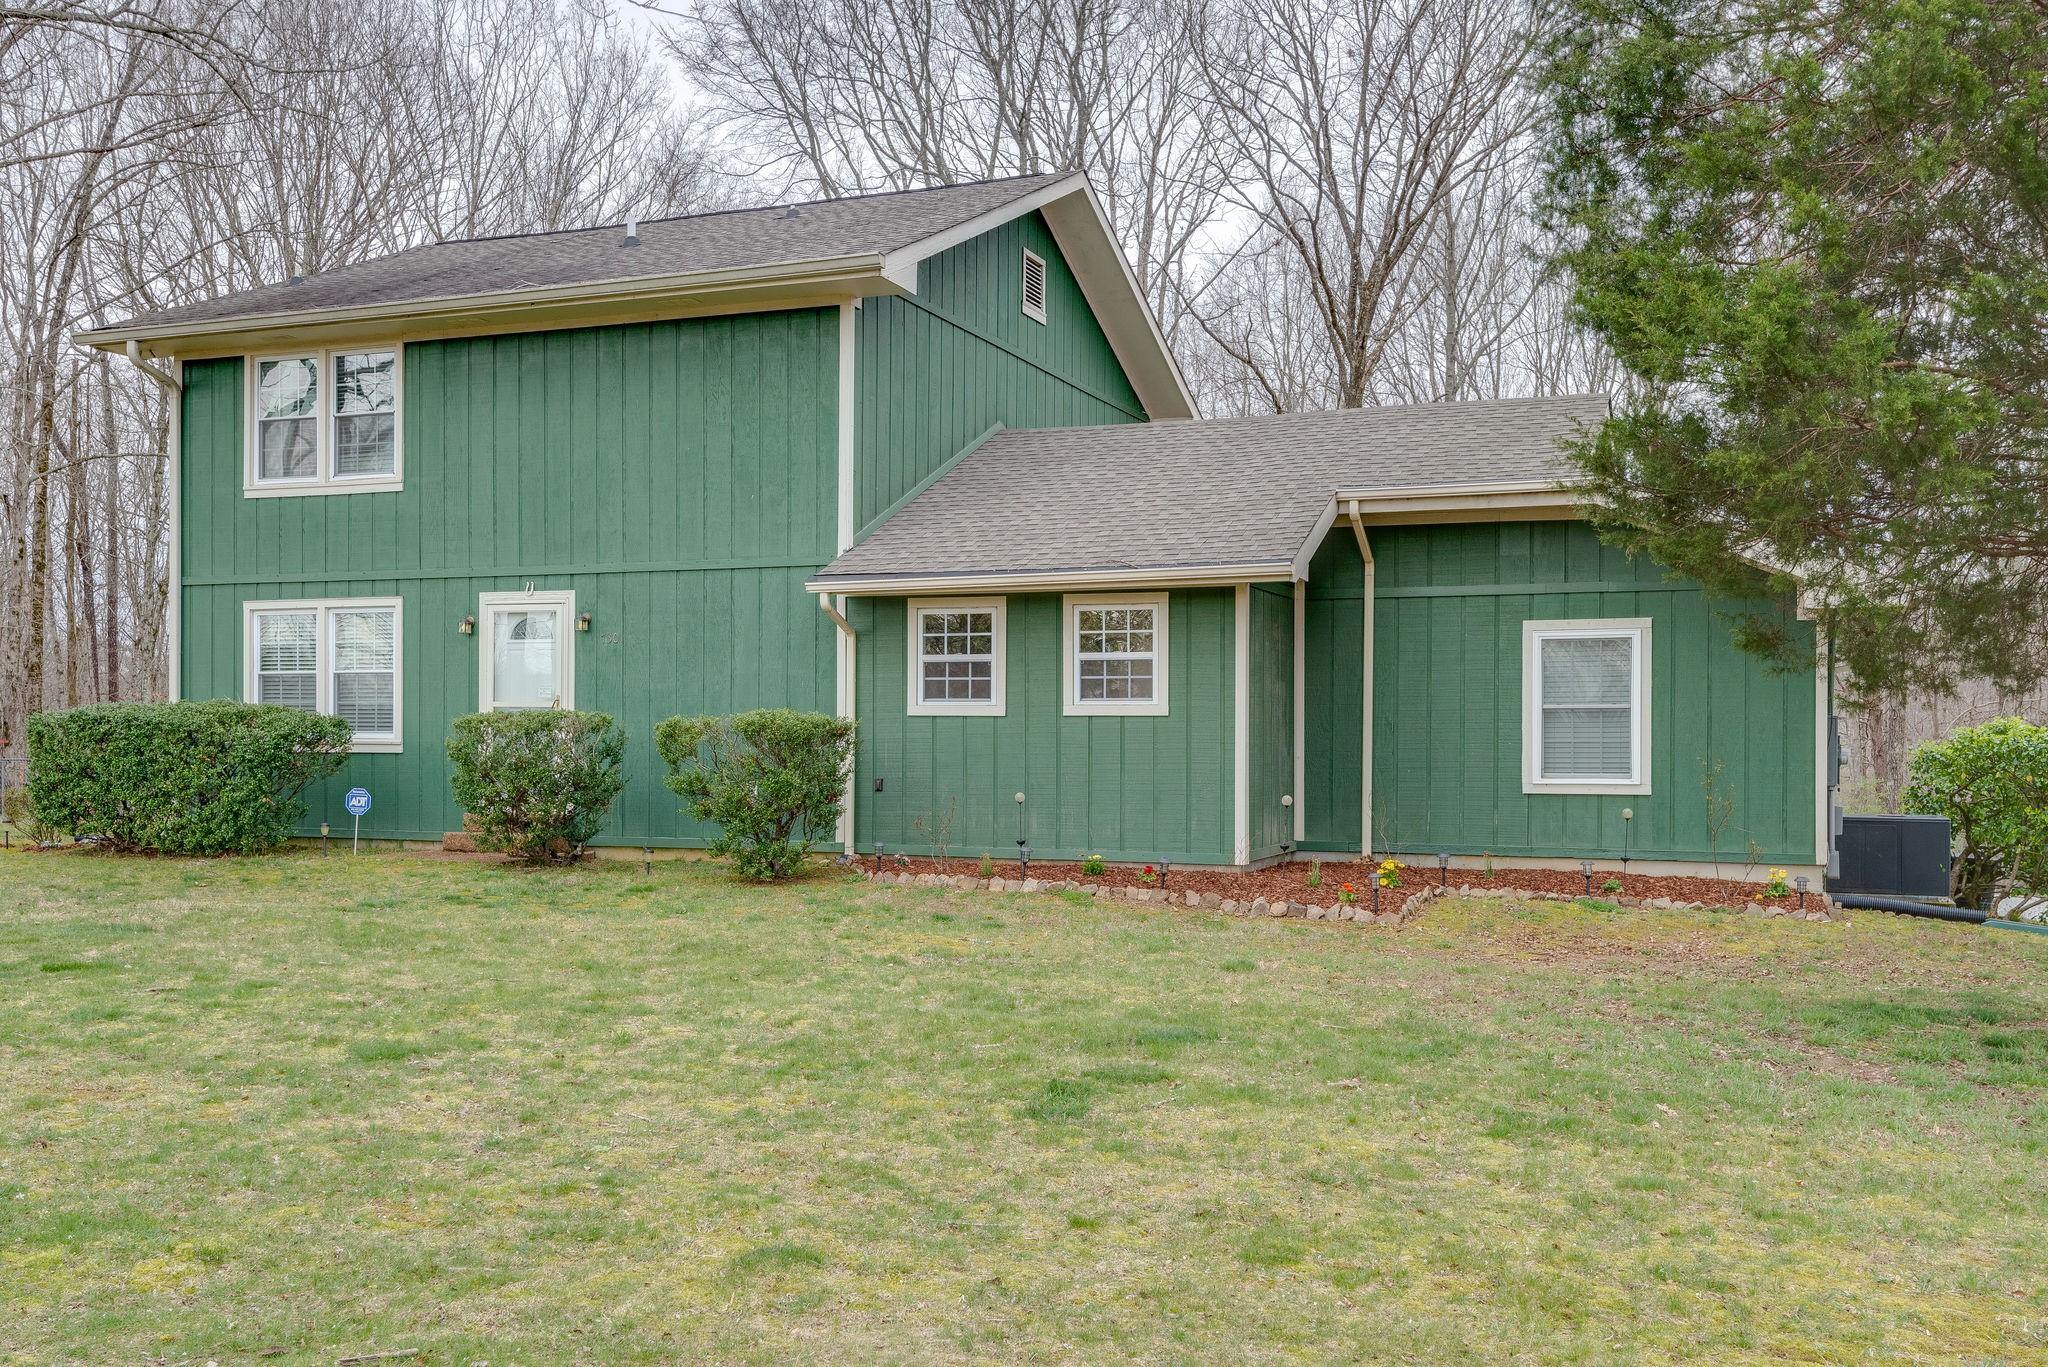 730 Mount Pleasant Rd, Kingston Springs, TN 37082 - Kingston Springs, TN real estate listing